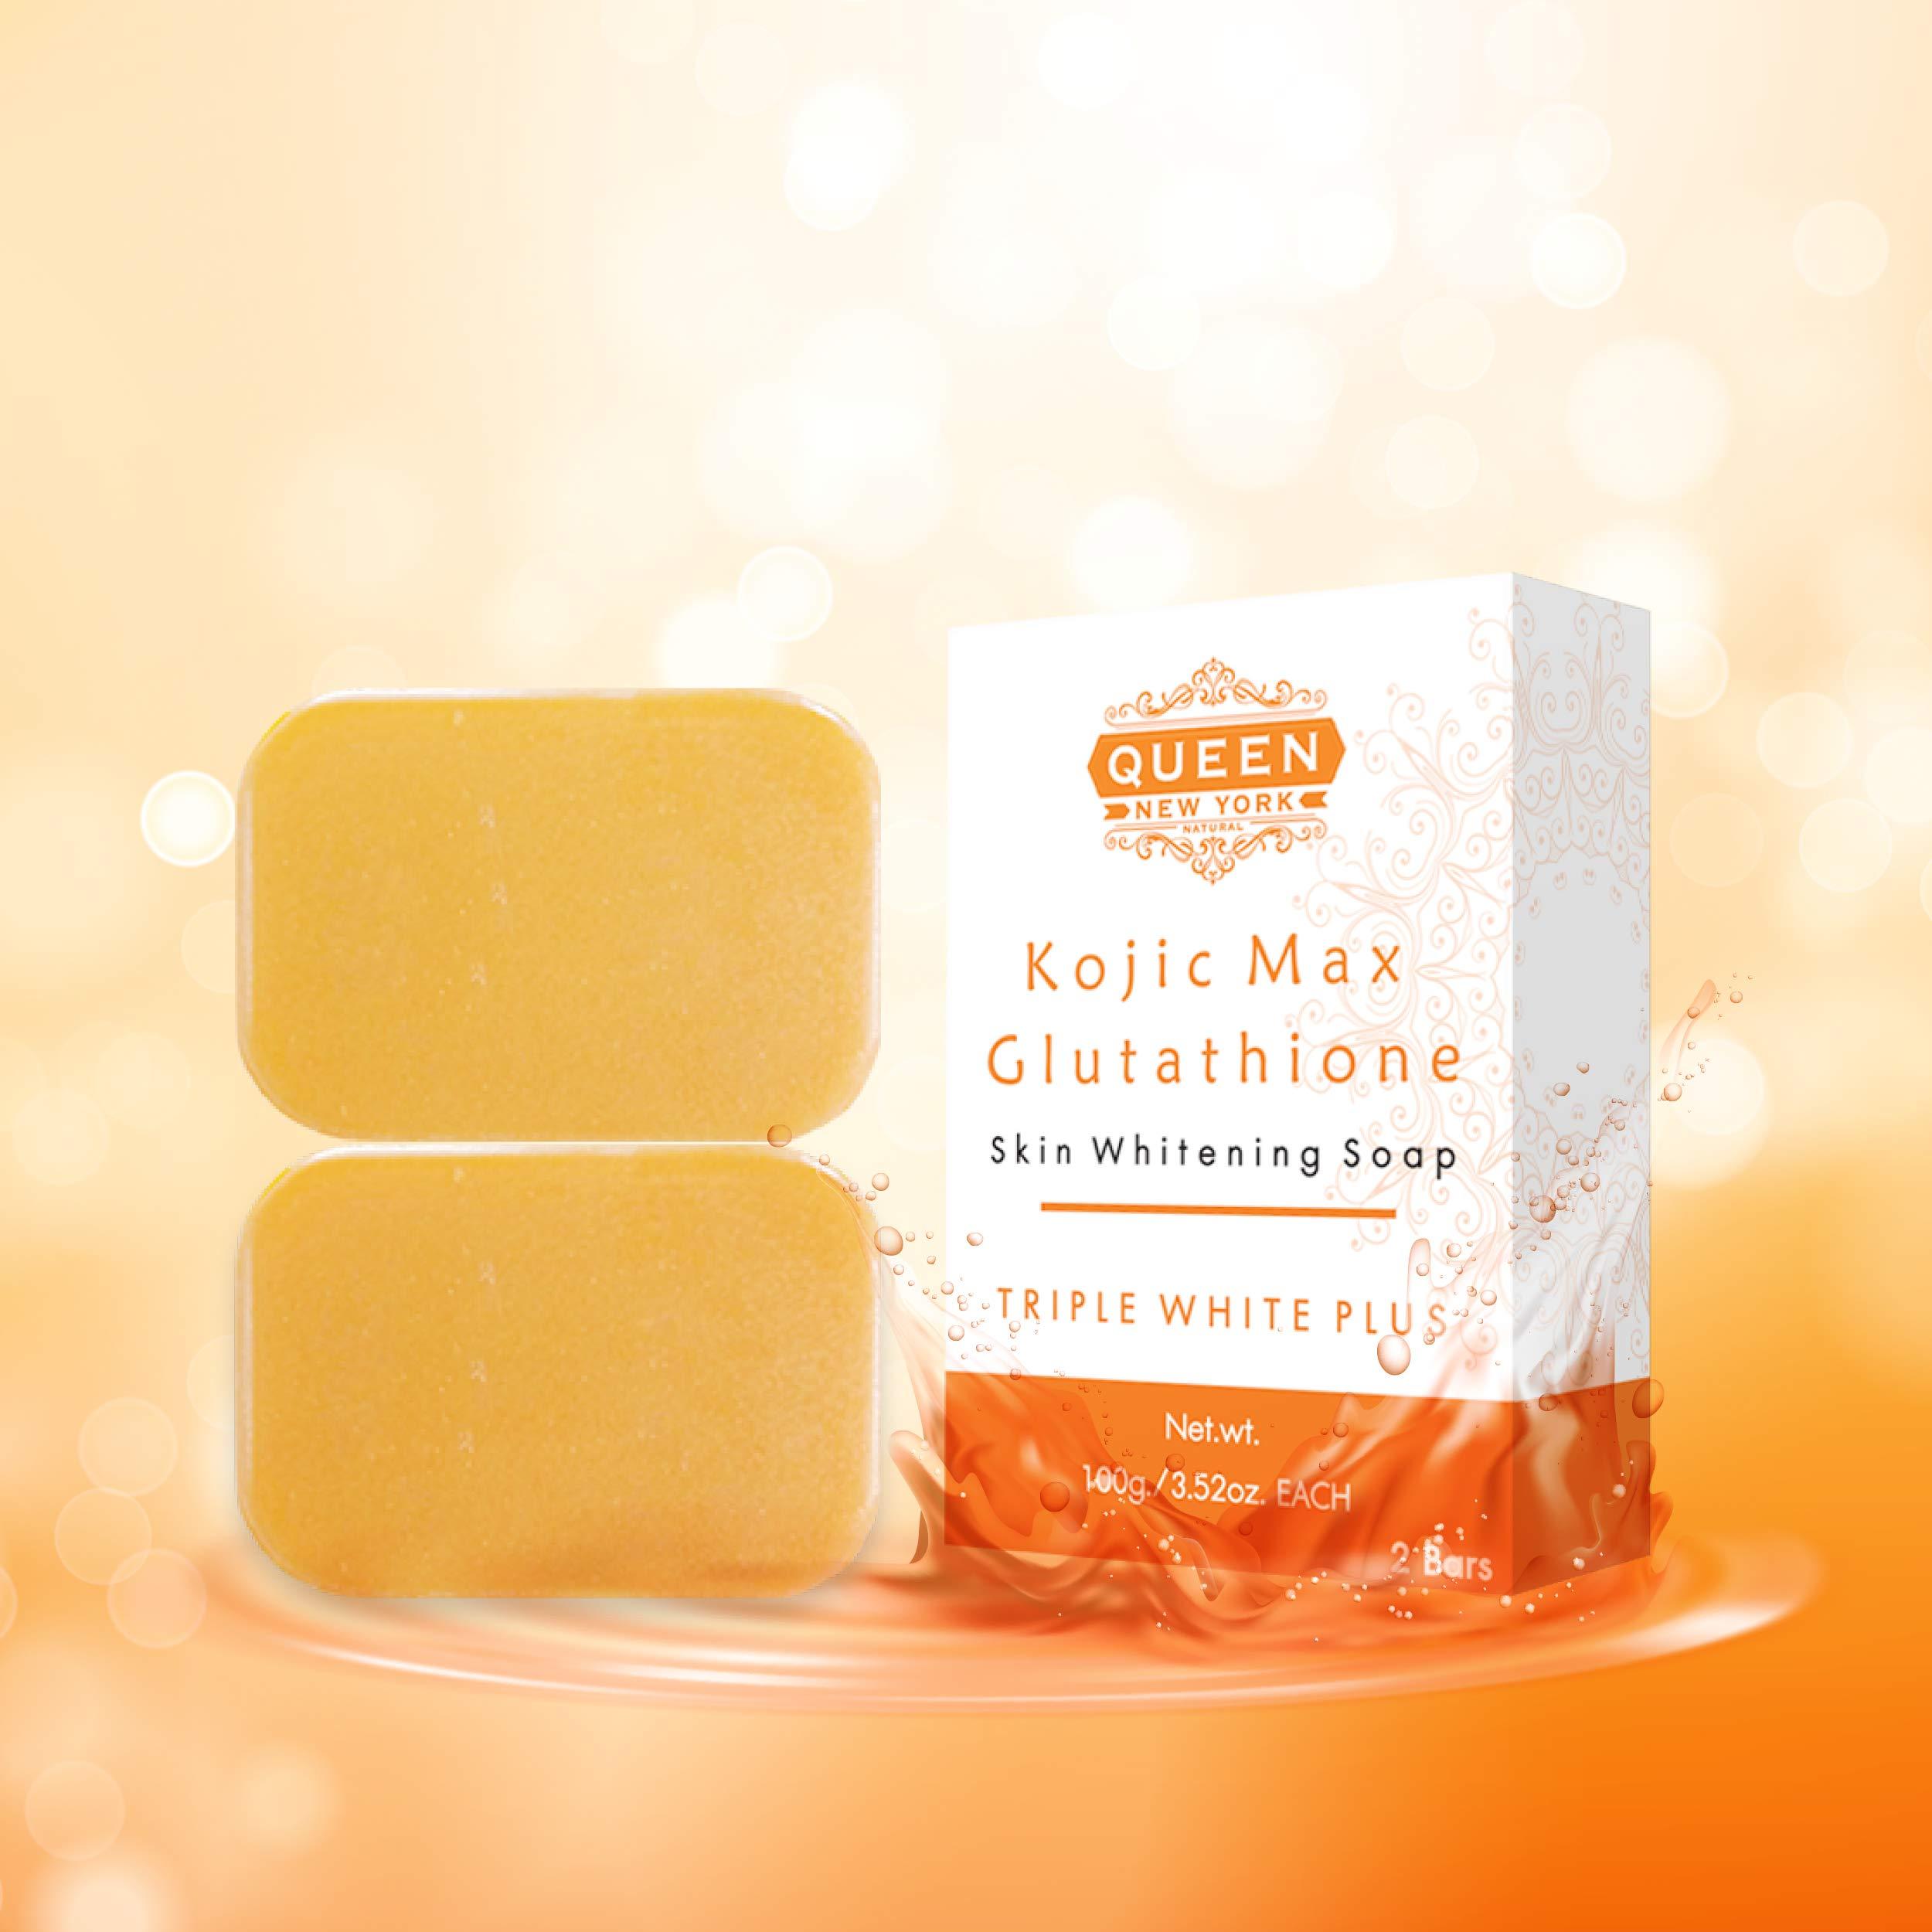 QUEEN Natural Skin Whitening Soap Bar Triple White Plus WHIPP Soap Premium formula with Delicate Net for Softening Whip Foam (Kojic+Gluta, 2 Bars+Mesh)